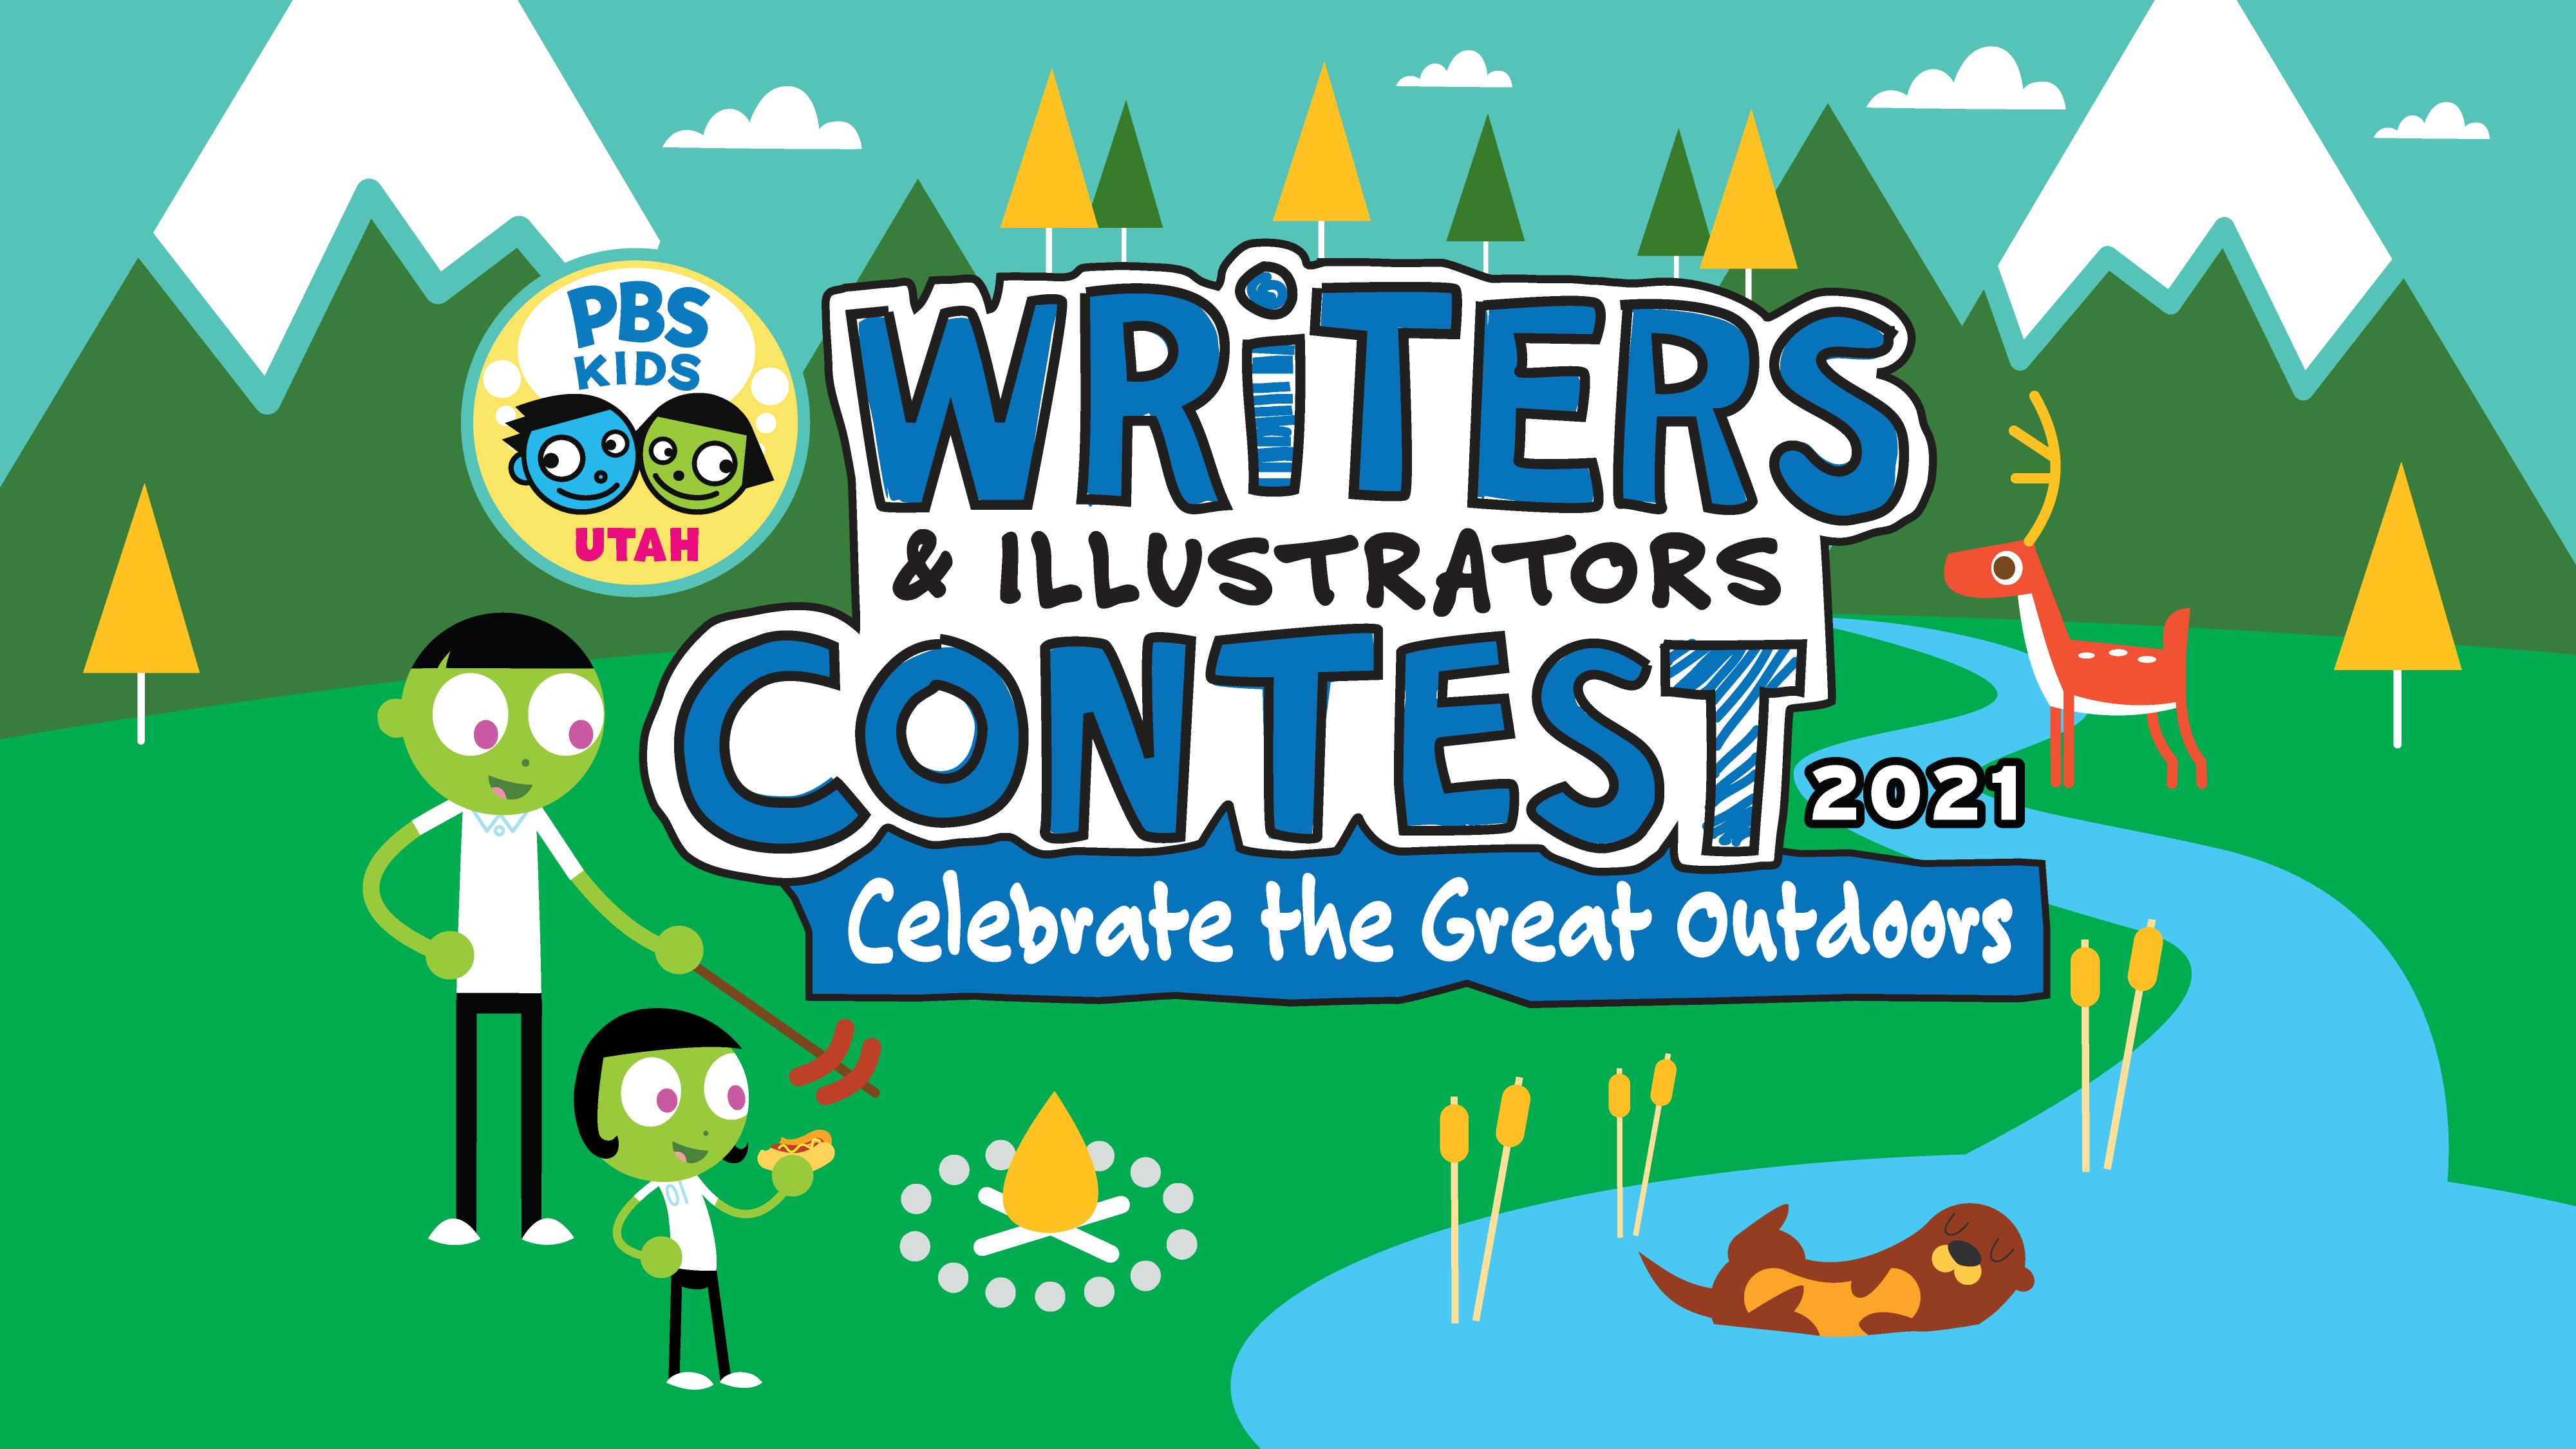 Writers & Illustrators Contest 2021